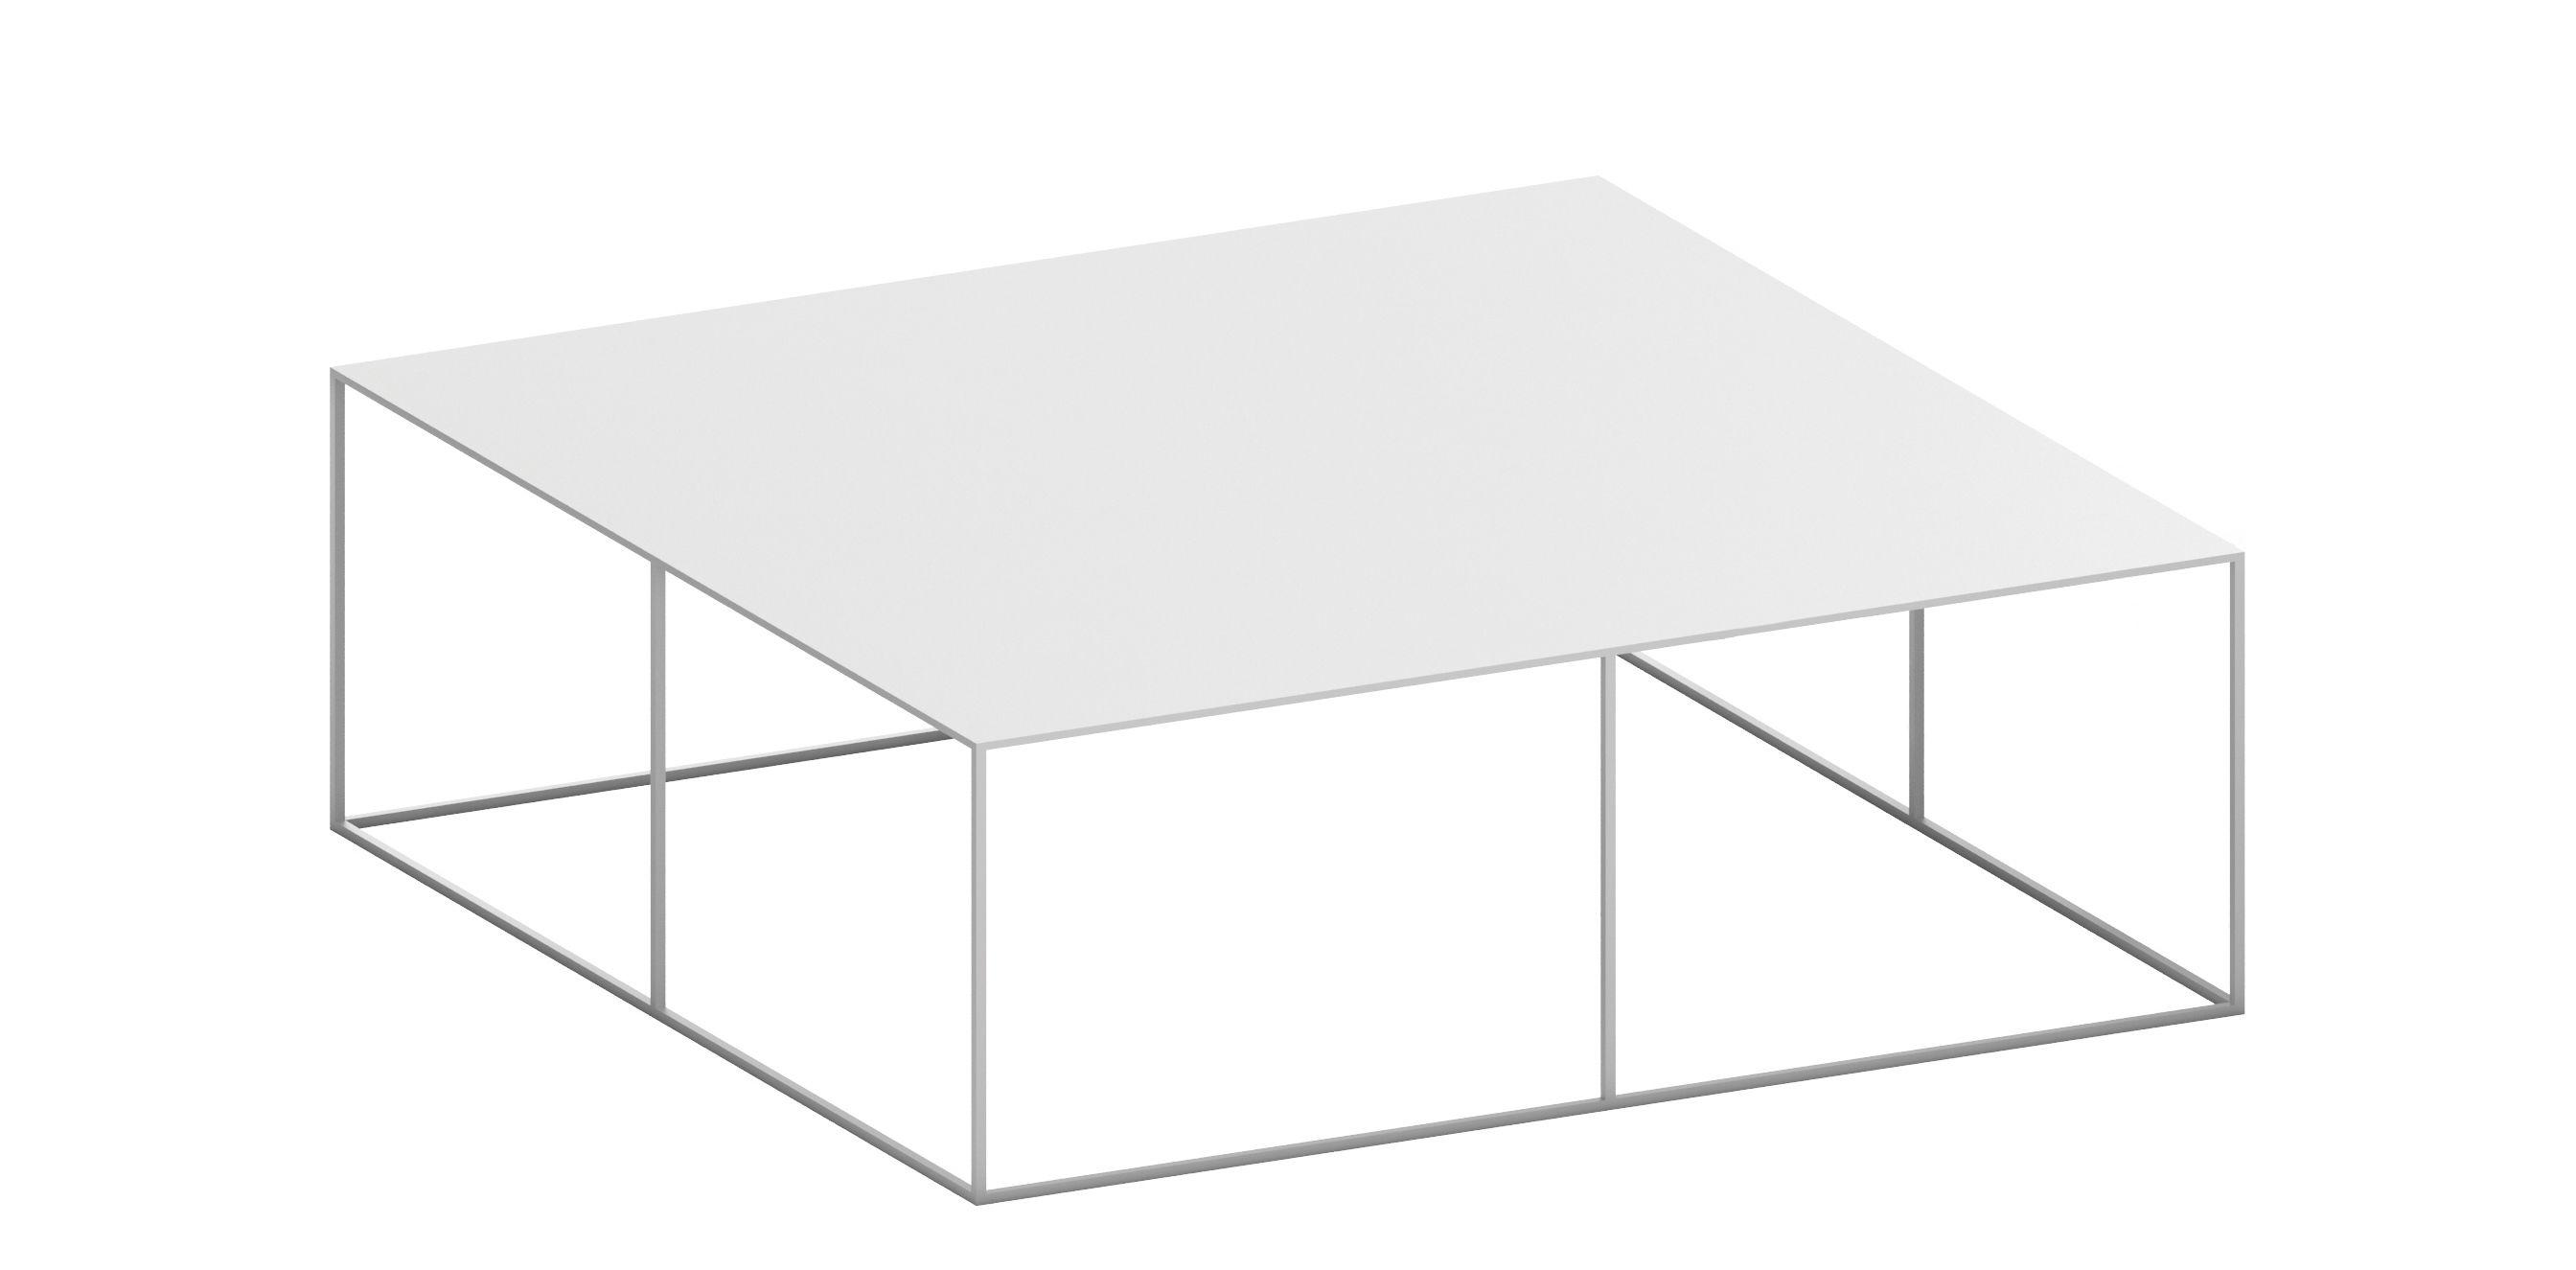 Table basse slim irony 100 x 100 x h 34 cm blanc zeus for Table basse design 100 x 100